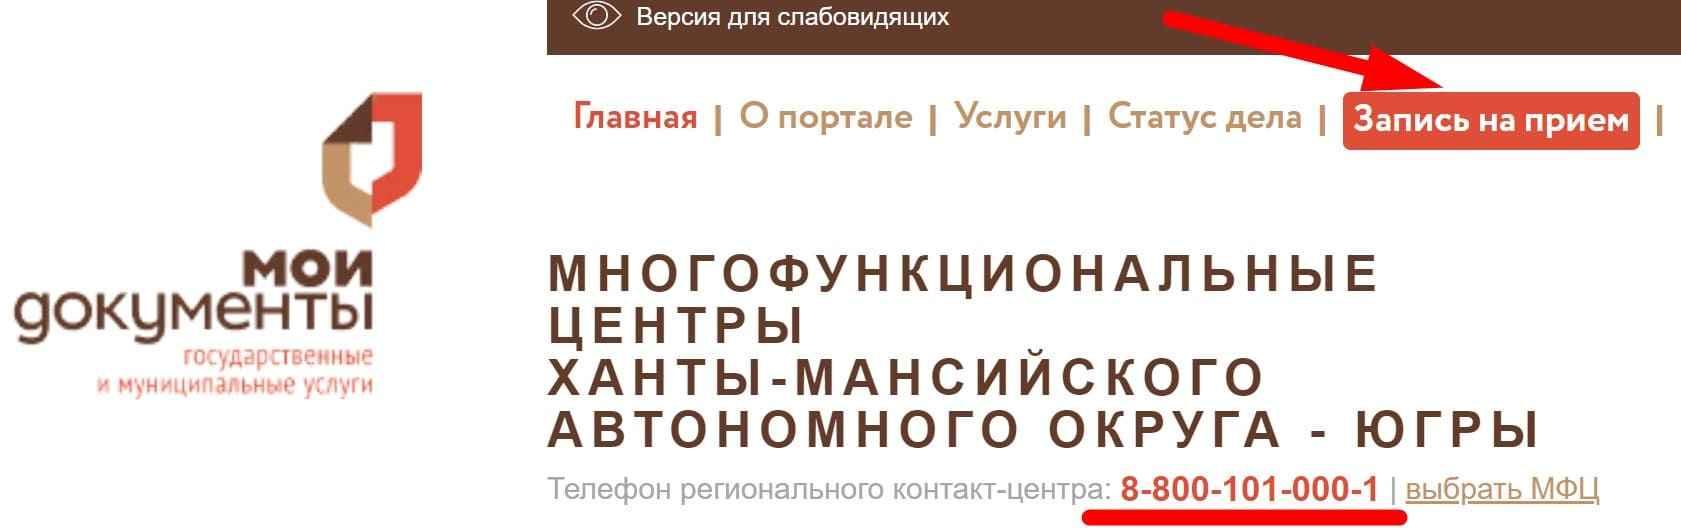 Сайт МФЦ Нижневартовск